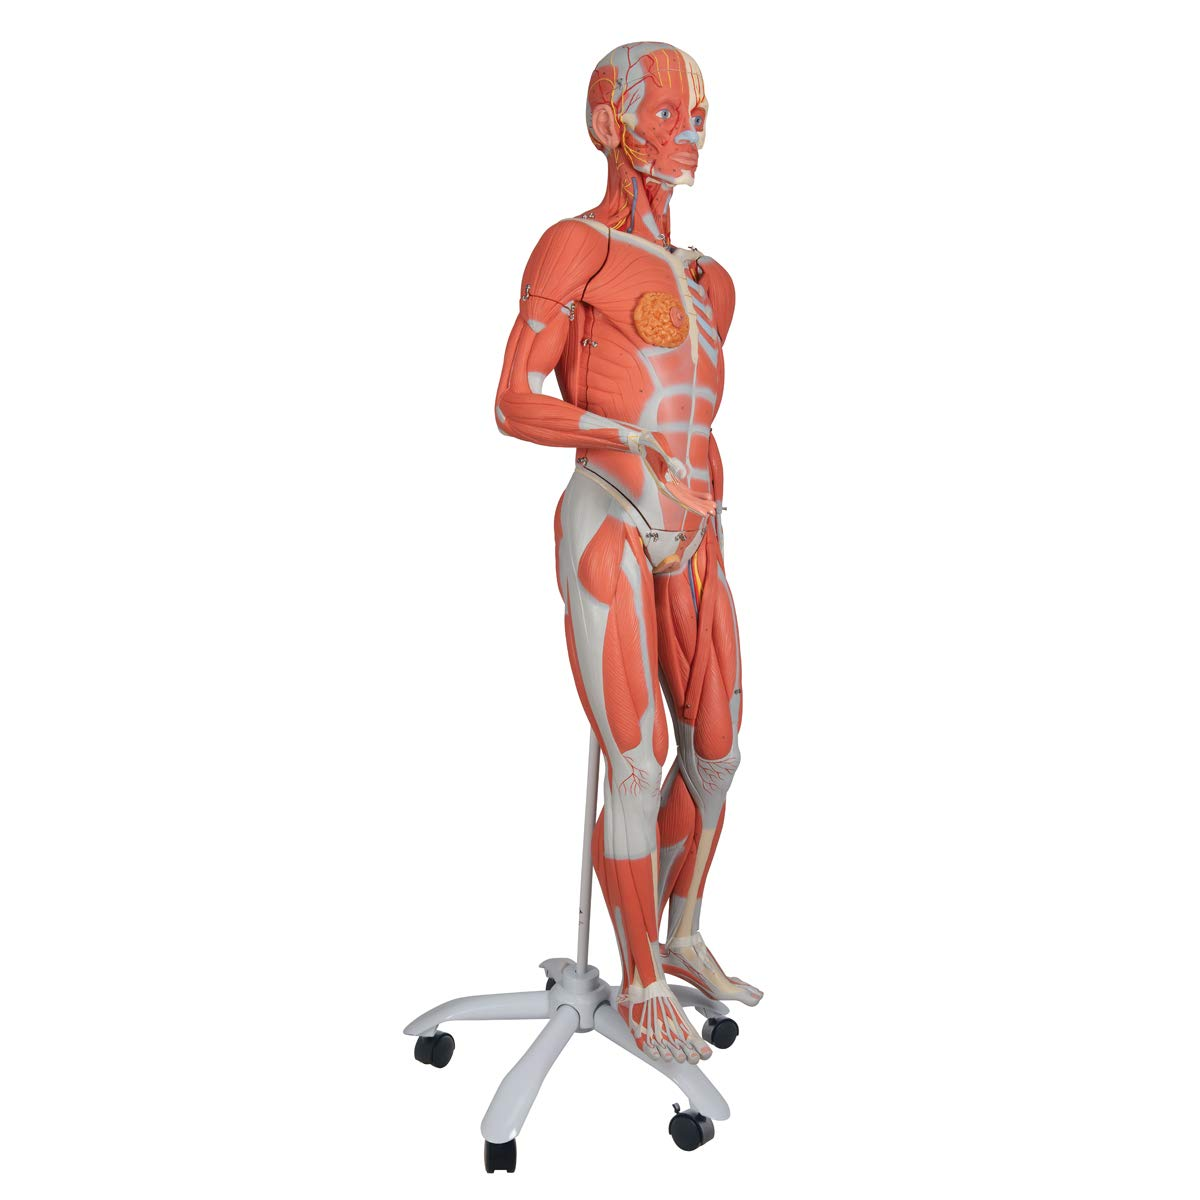 3B Scientific B51 23 Part 3/4 Life-Size Female Muscle Figure